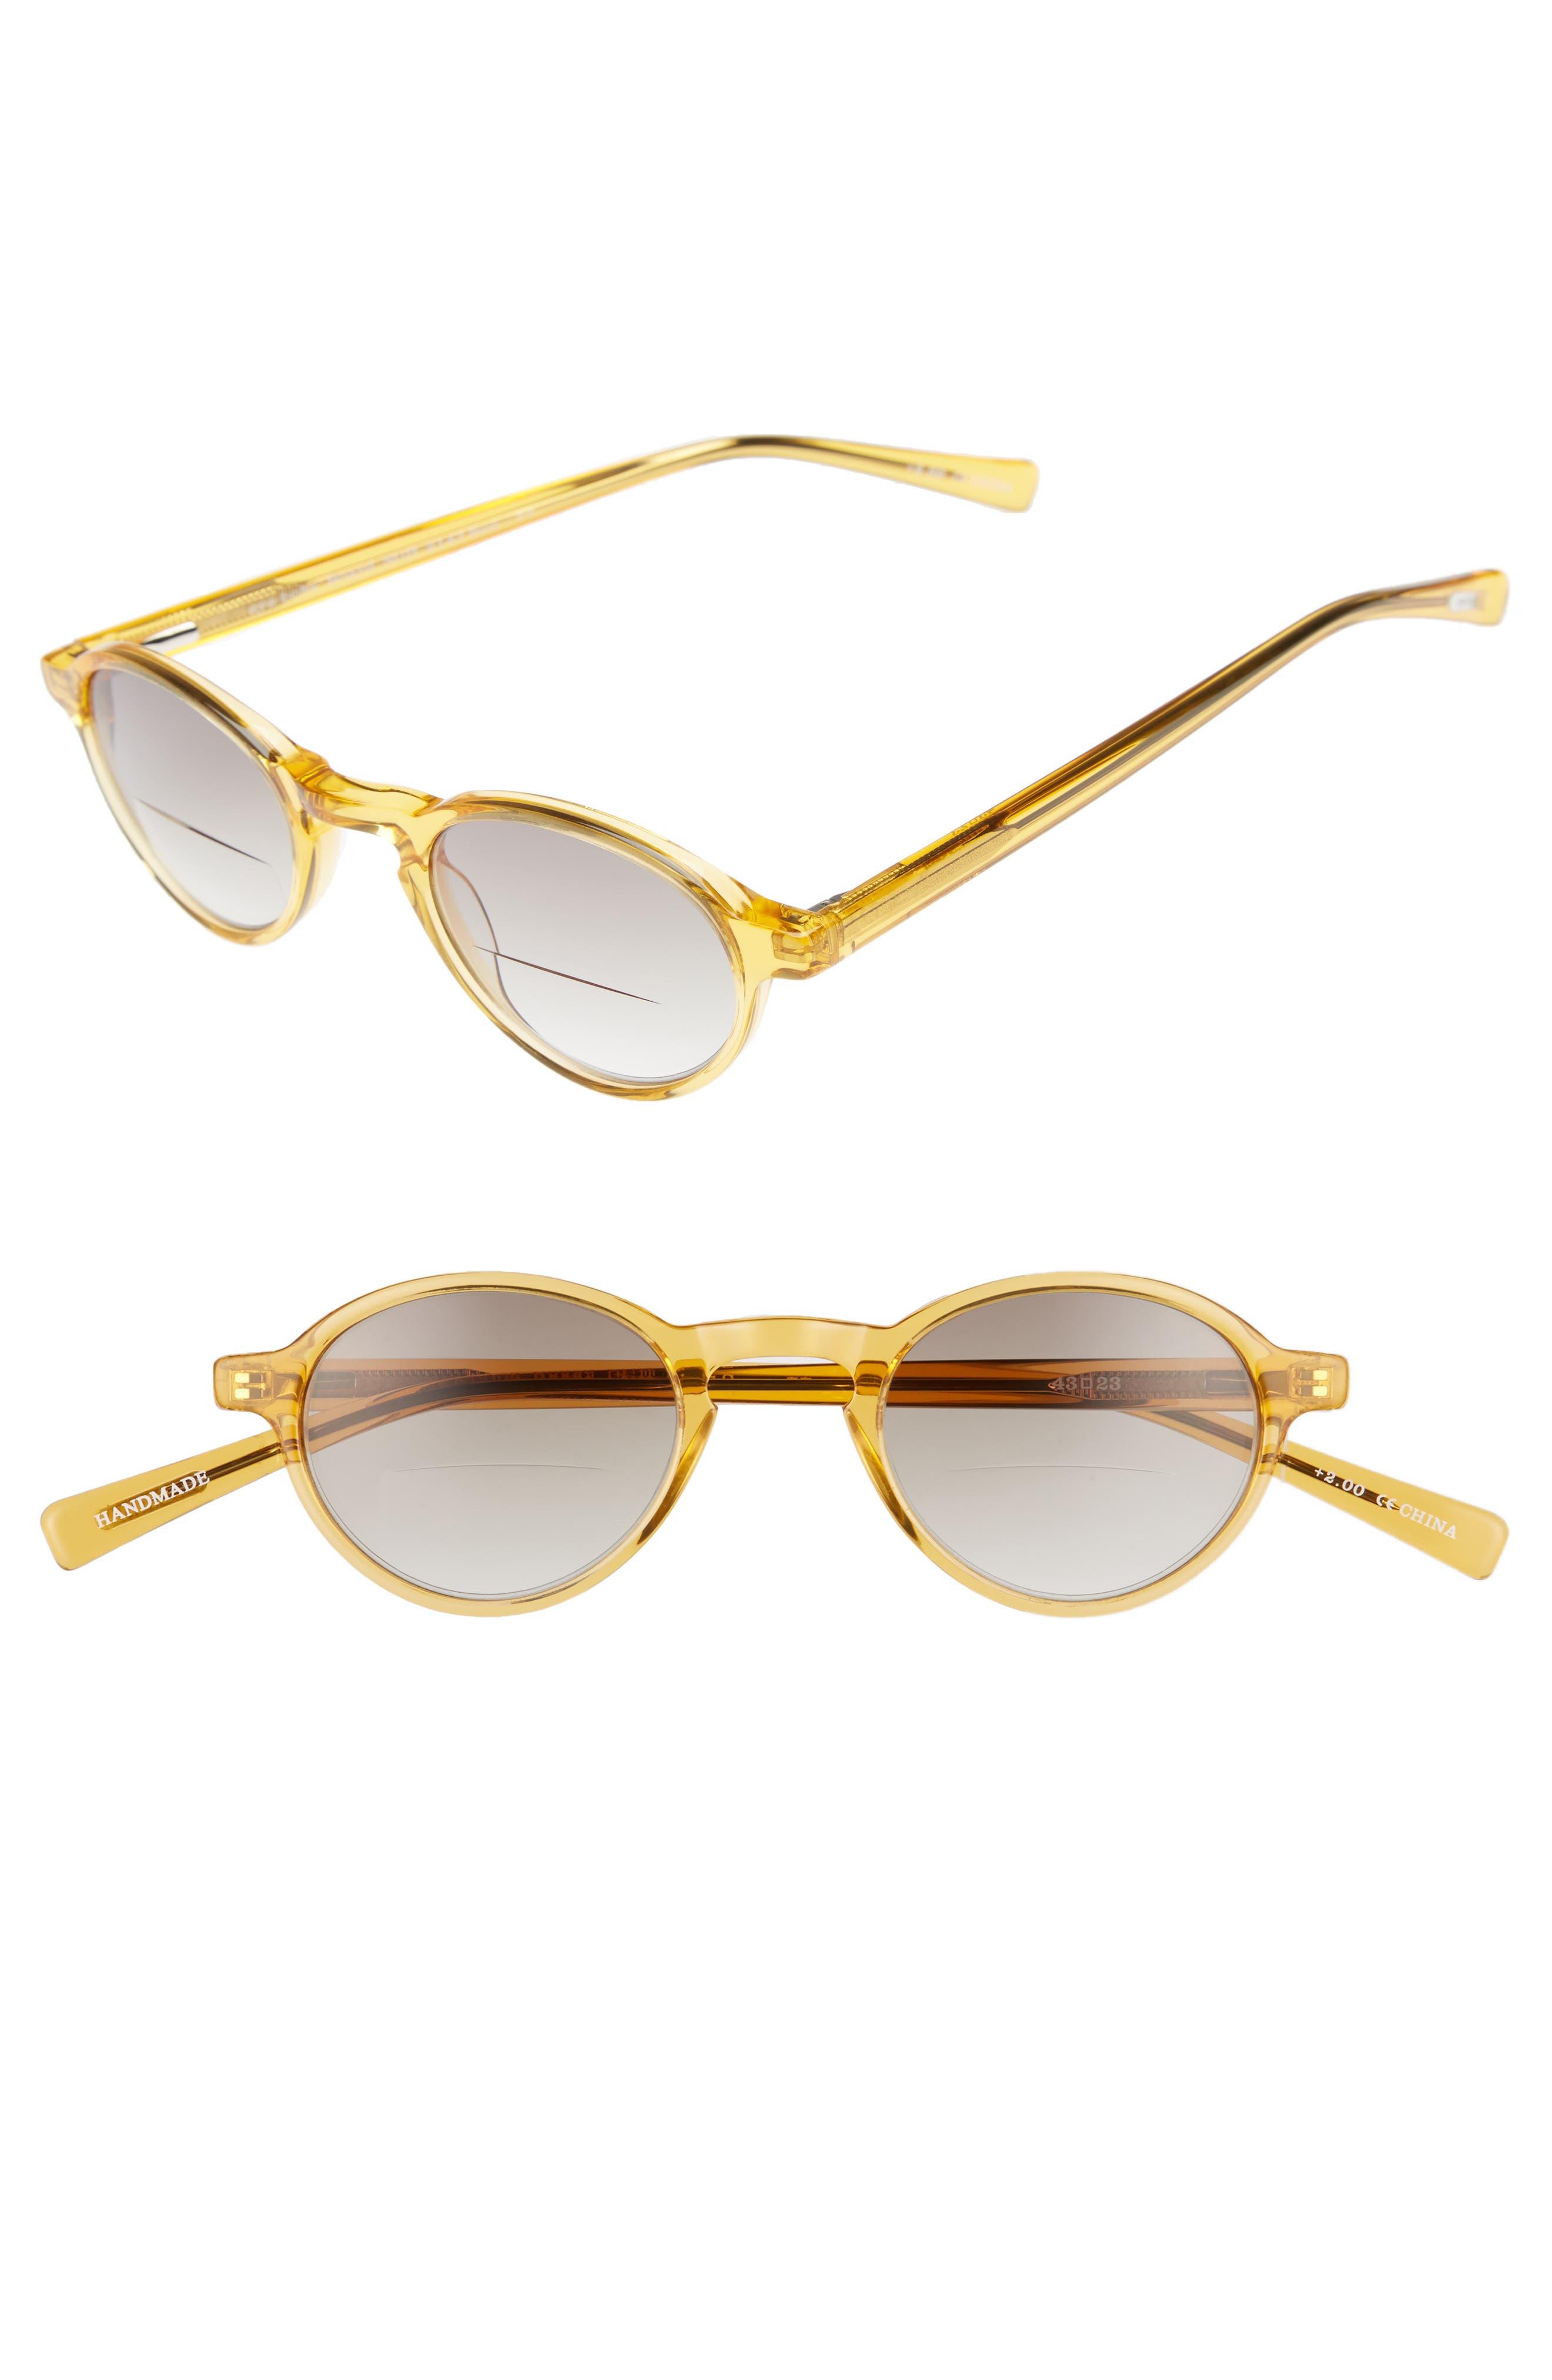 Board Stiff 43mm Reading Sunglasses,                         Main,                         color, ORANGE CRYSTAL